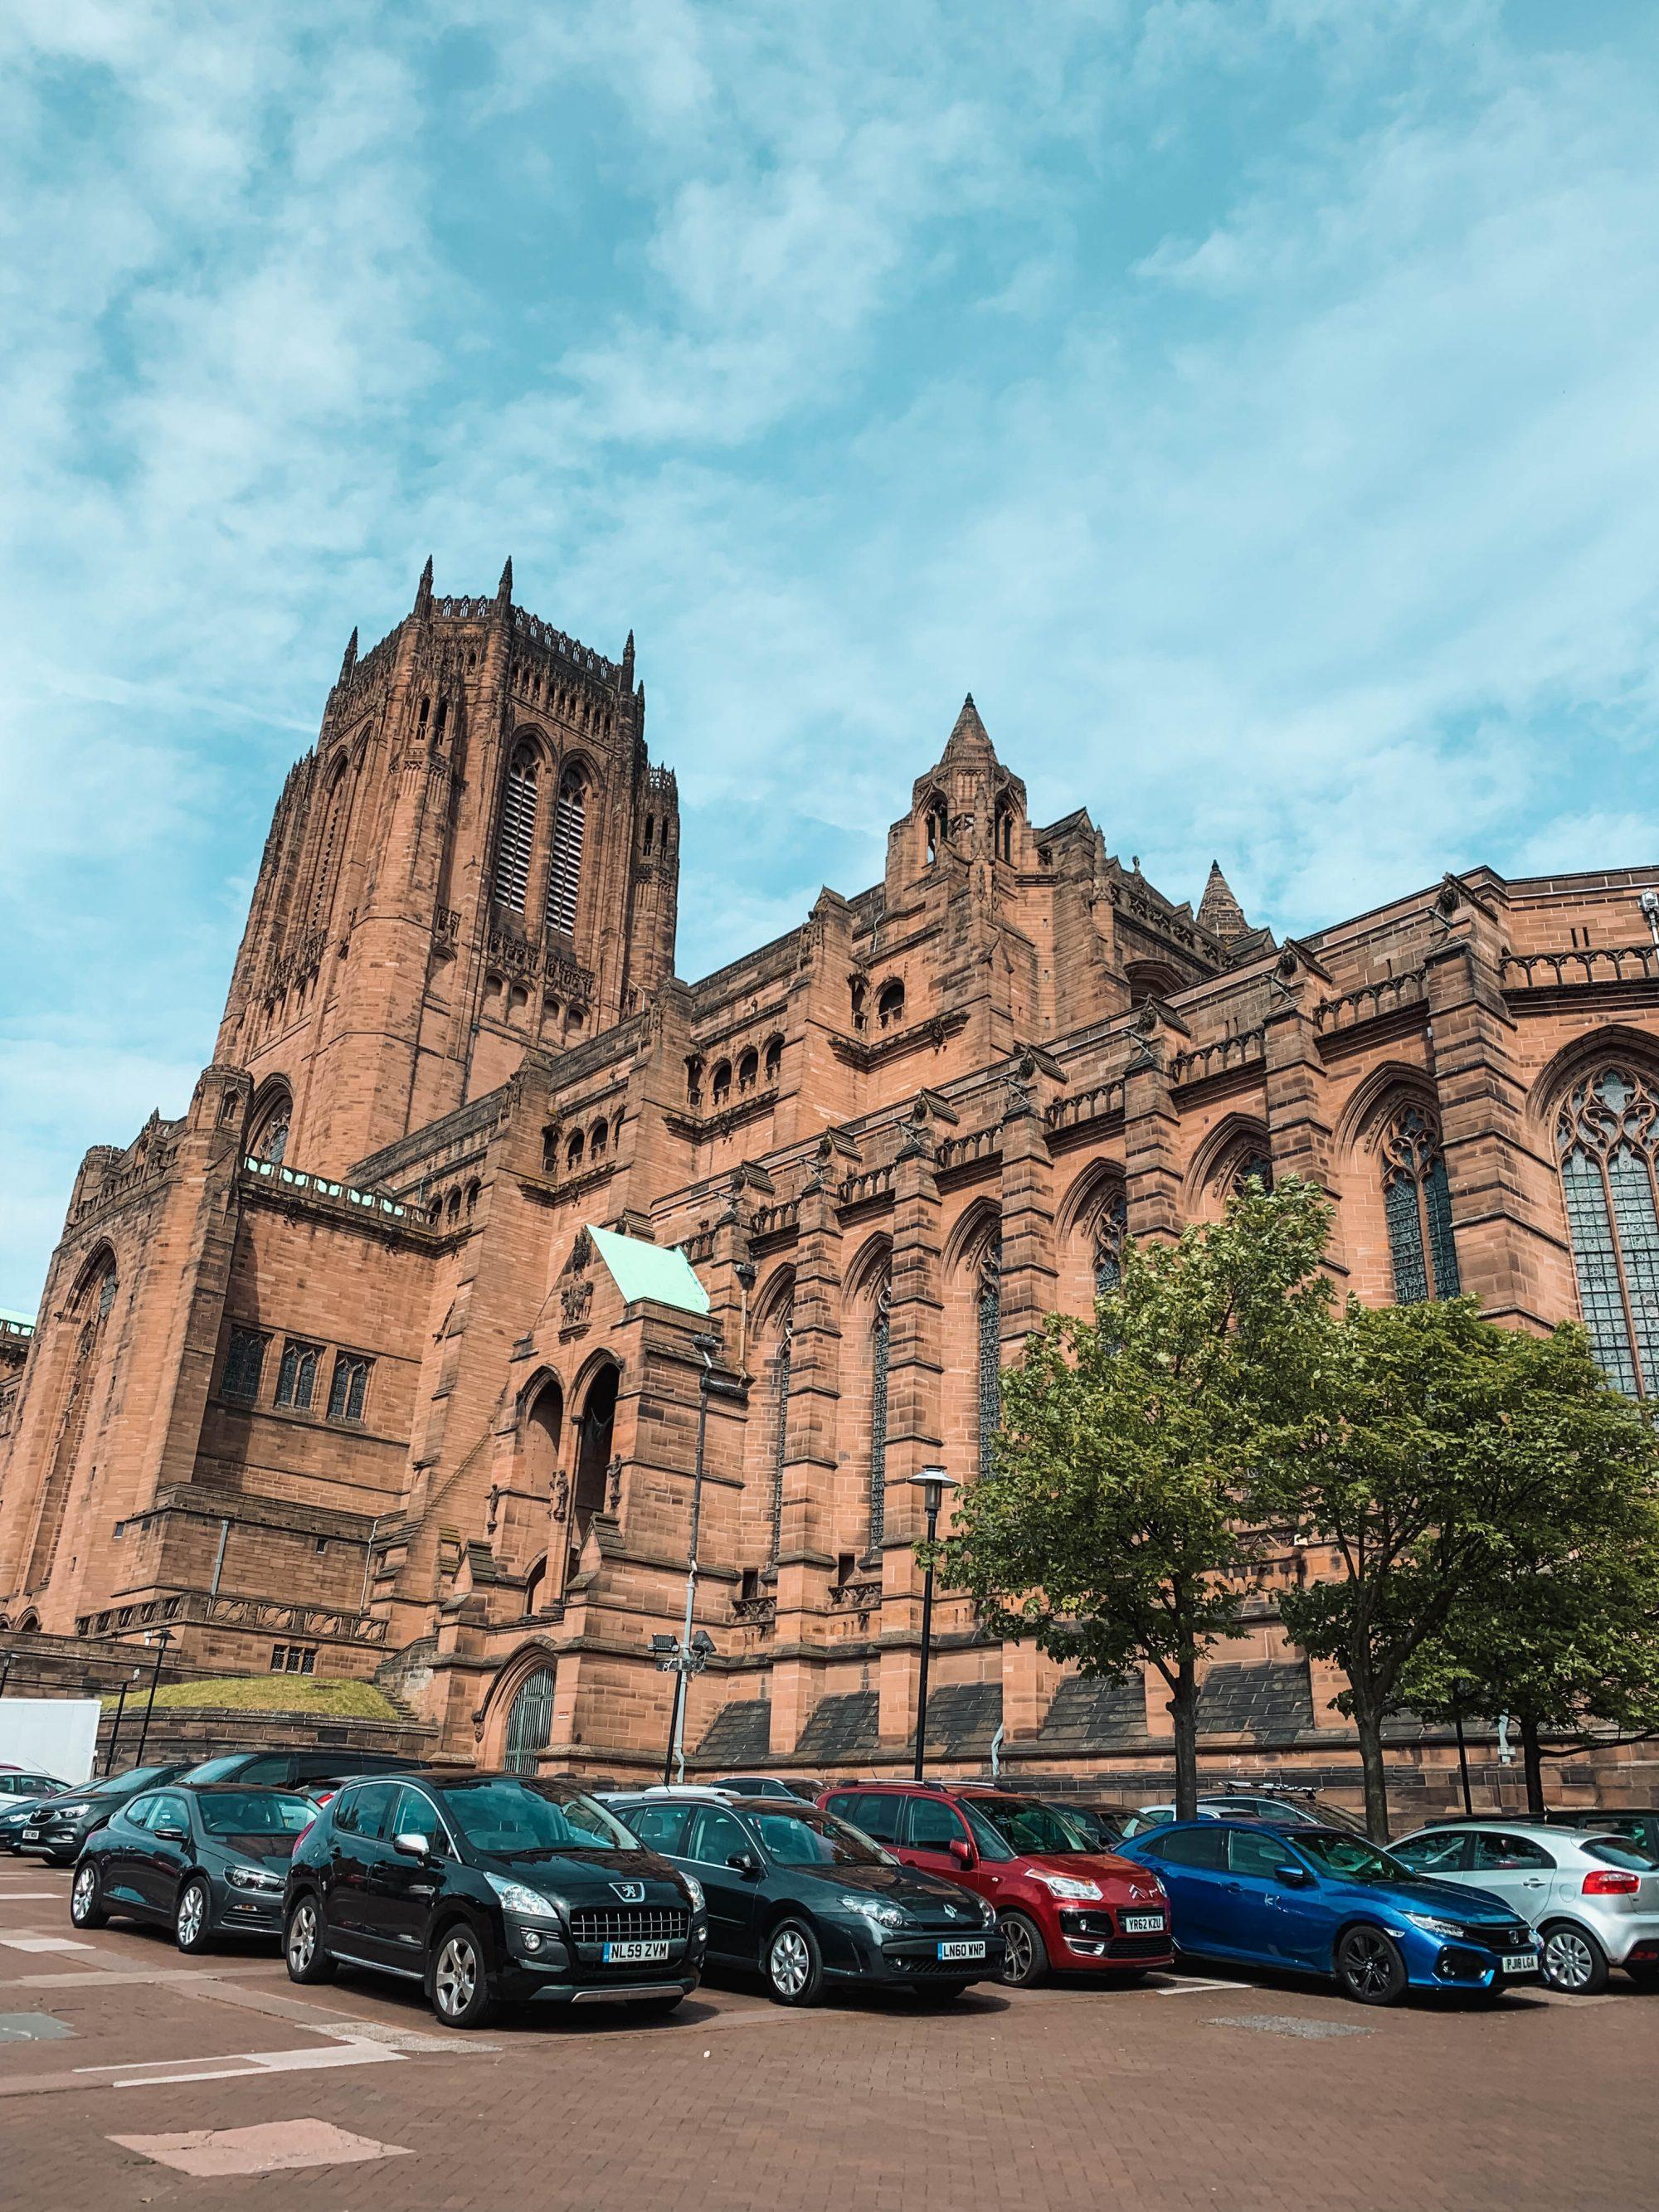 Liverpool Kathedrale, Urlaub in England